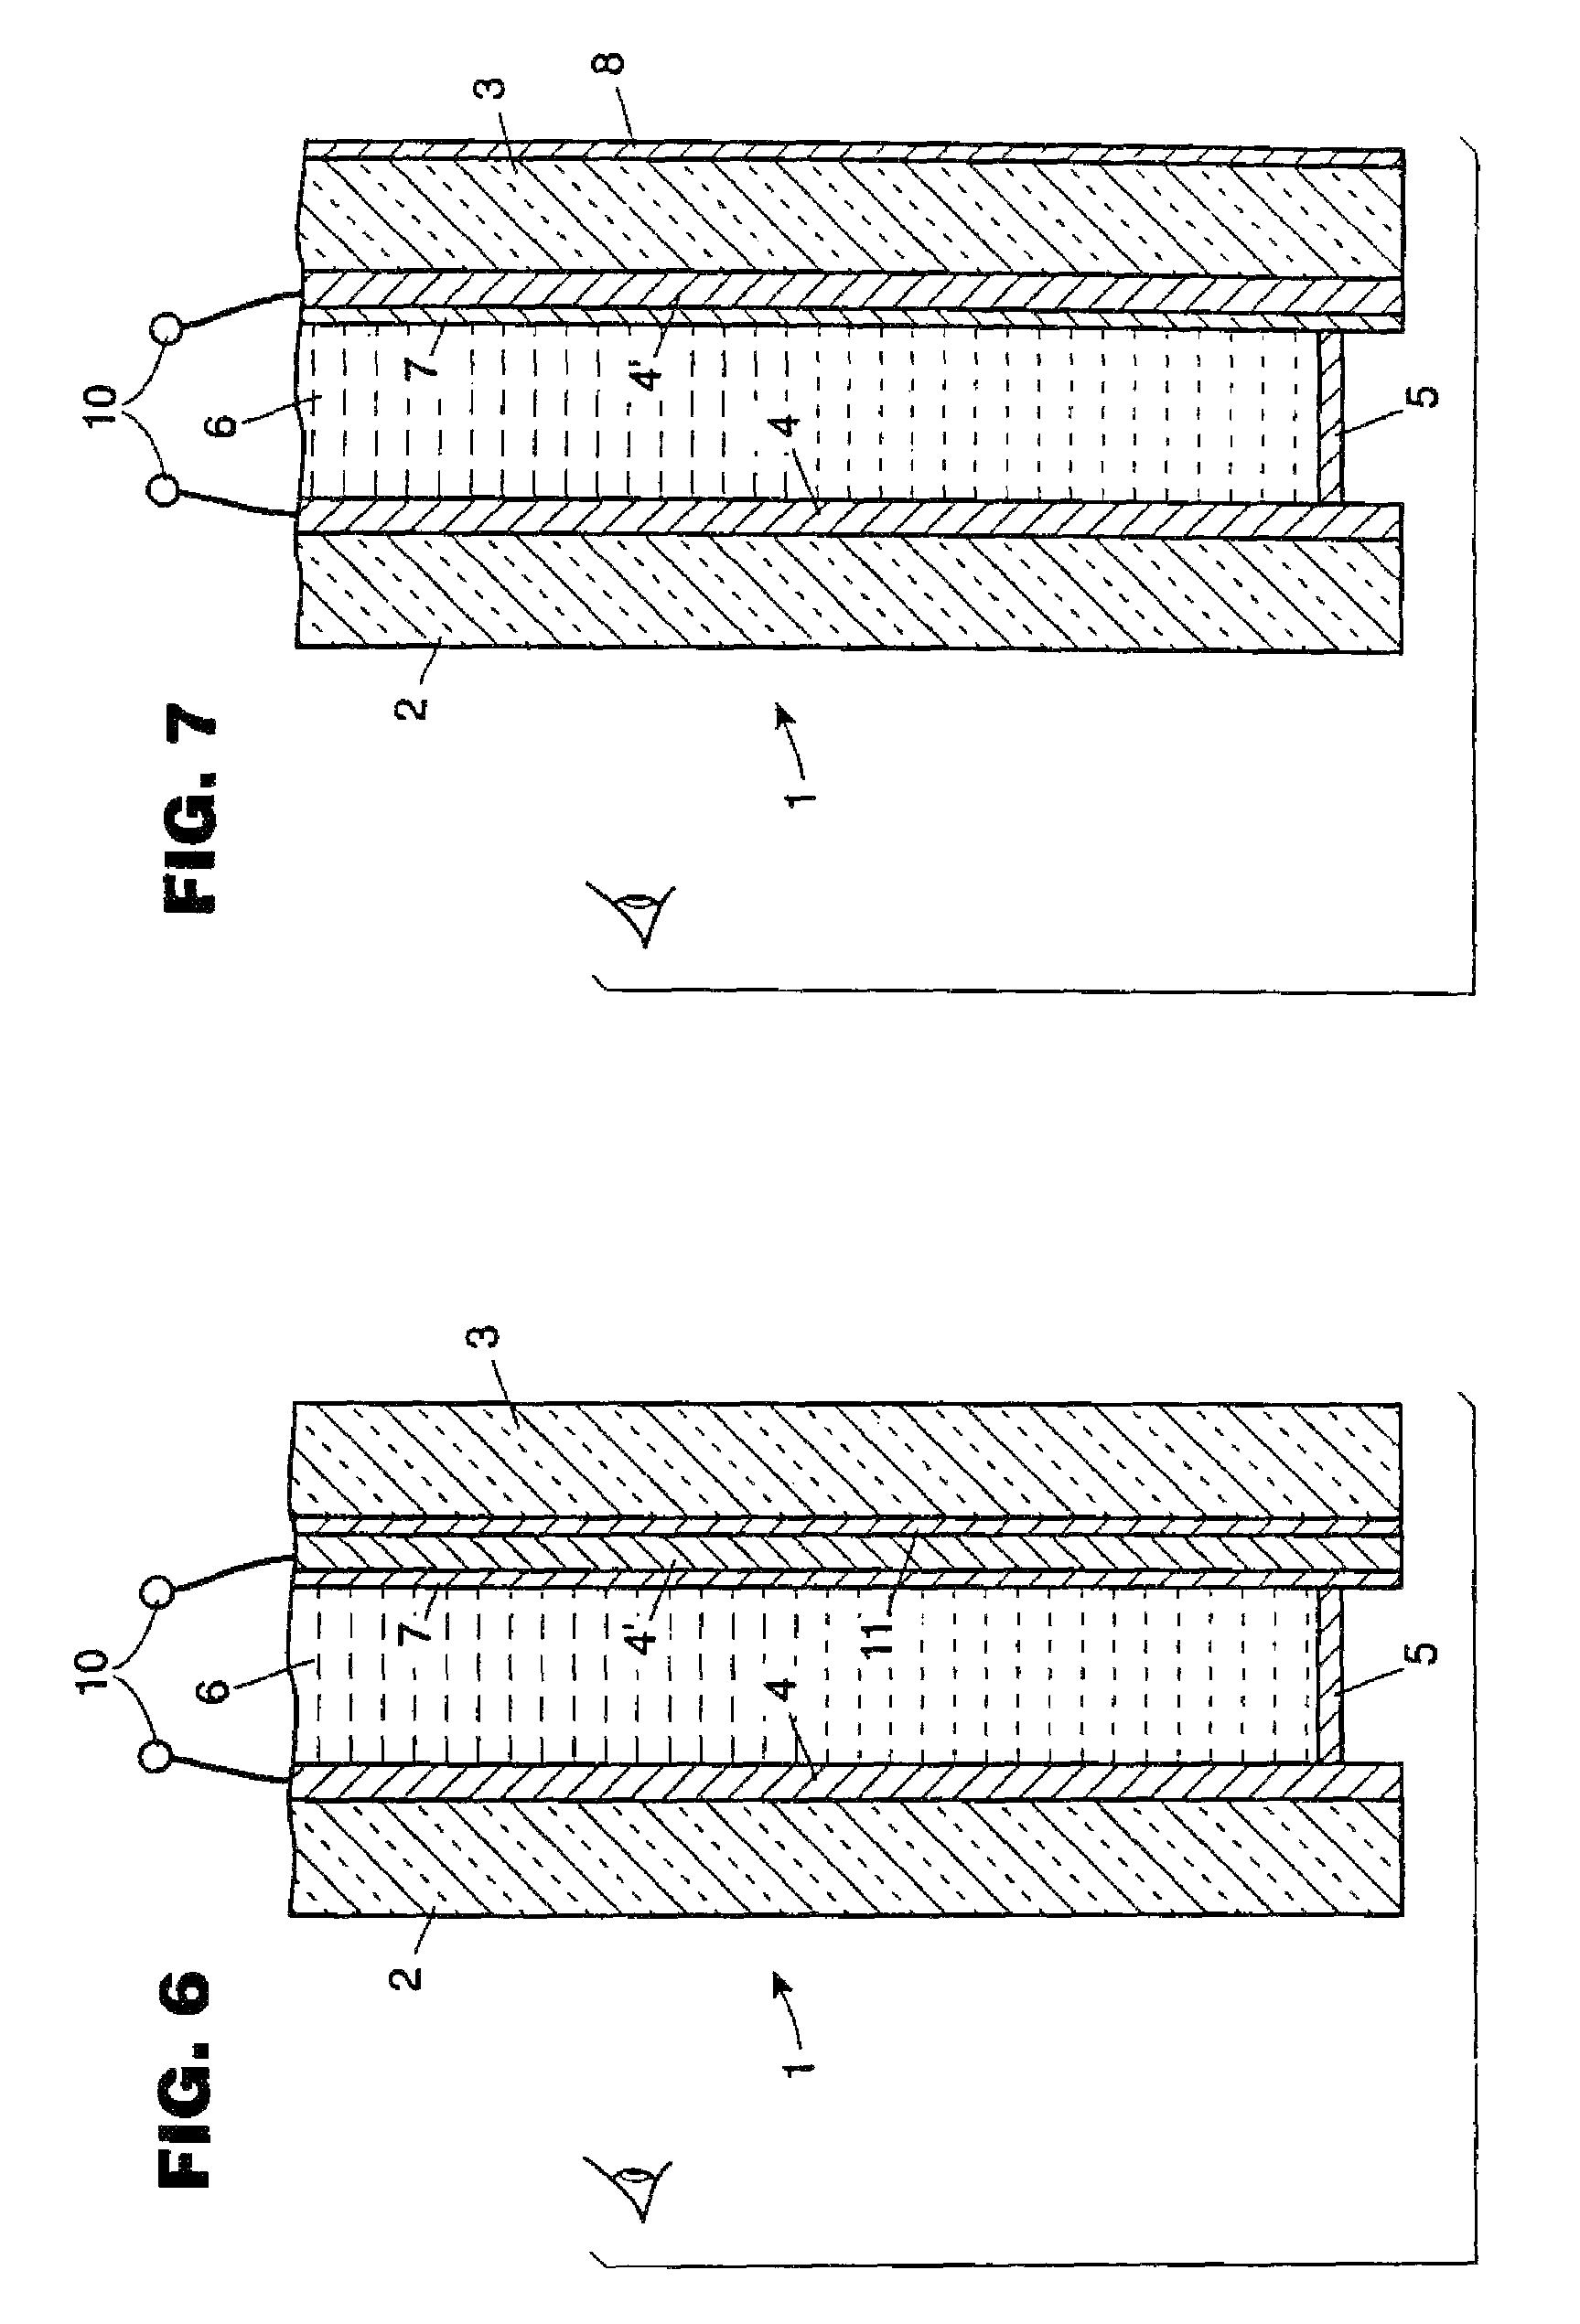 Patent Us 8511841 B2 St Louis Mini Cooper Engine Diagram 0 Petitions